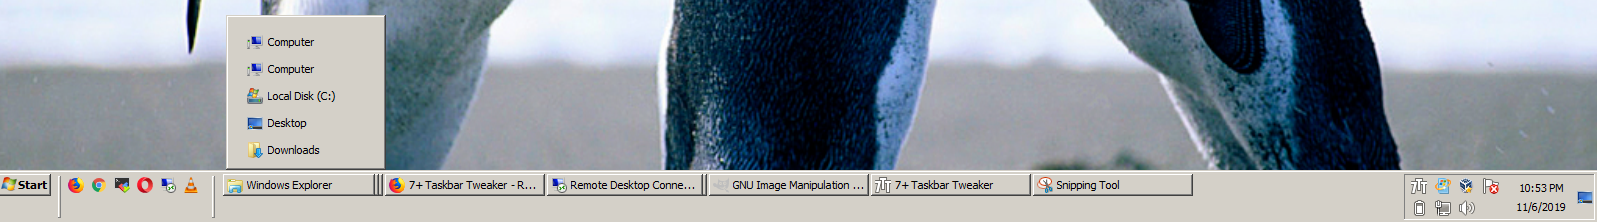 grouped-windows-in-windows-7-taskbar